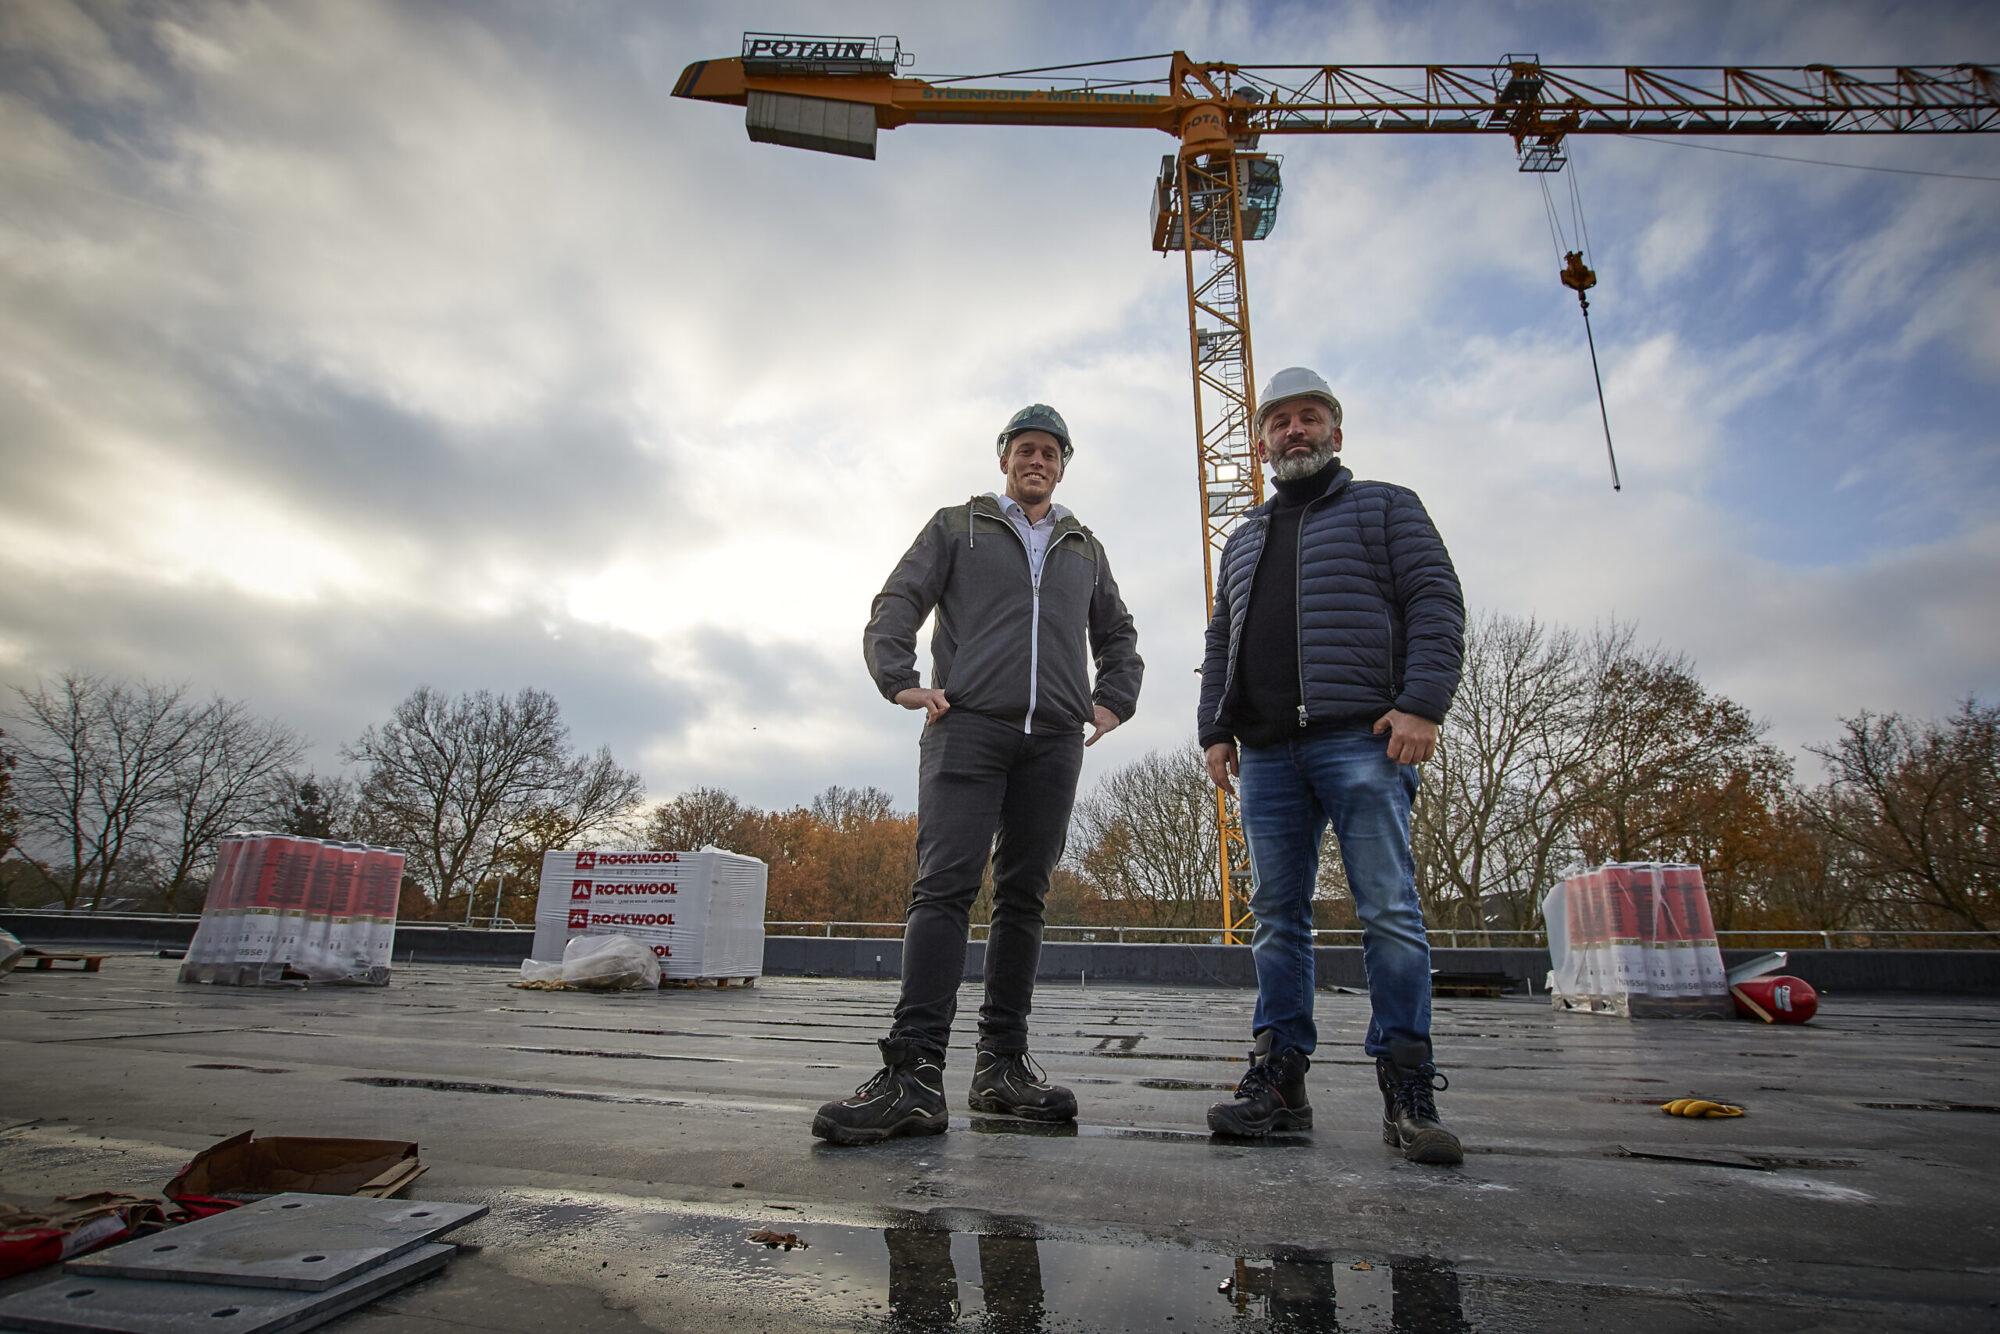 Trigon Bauunternehung GmbH